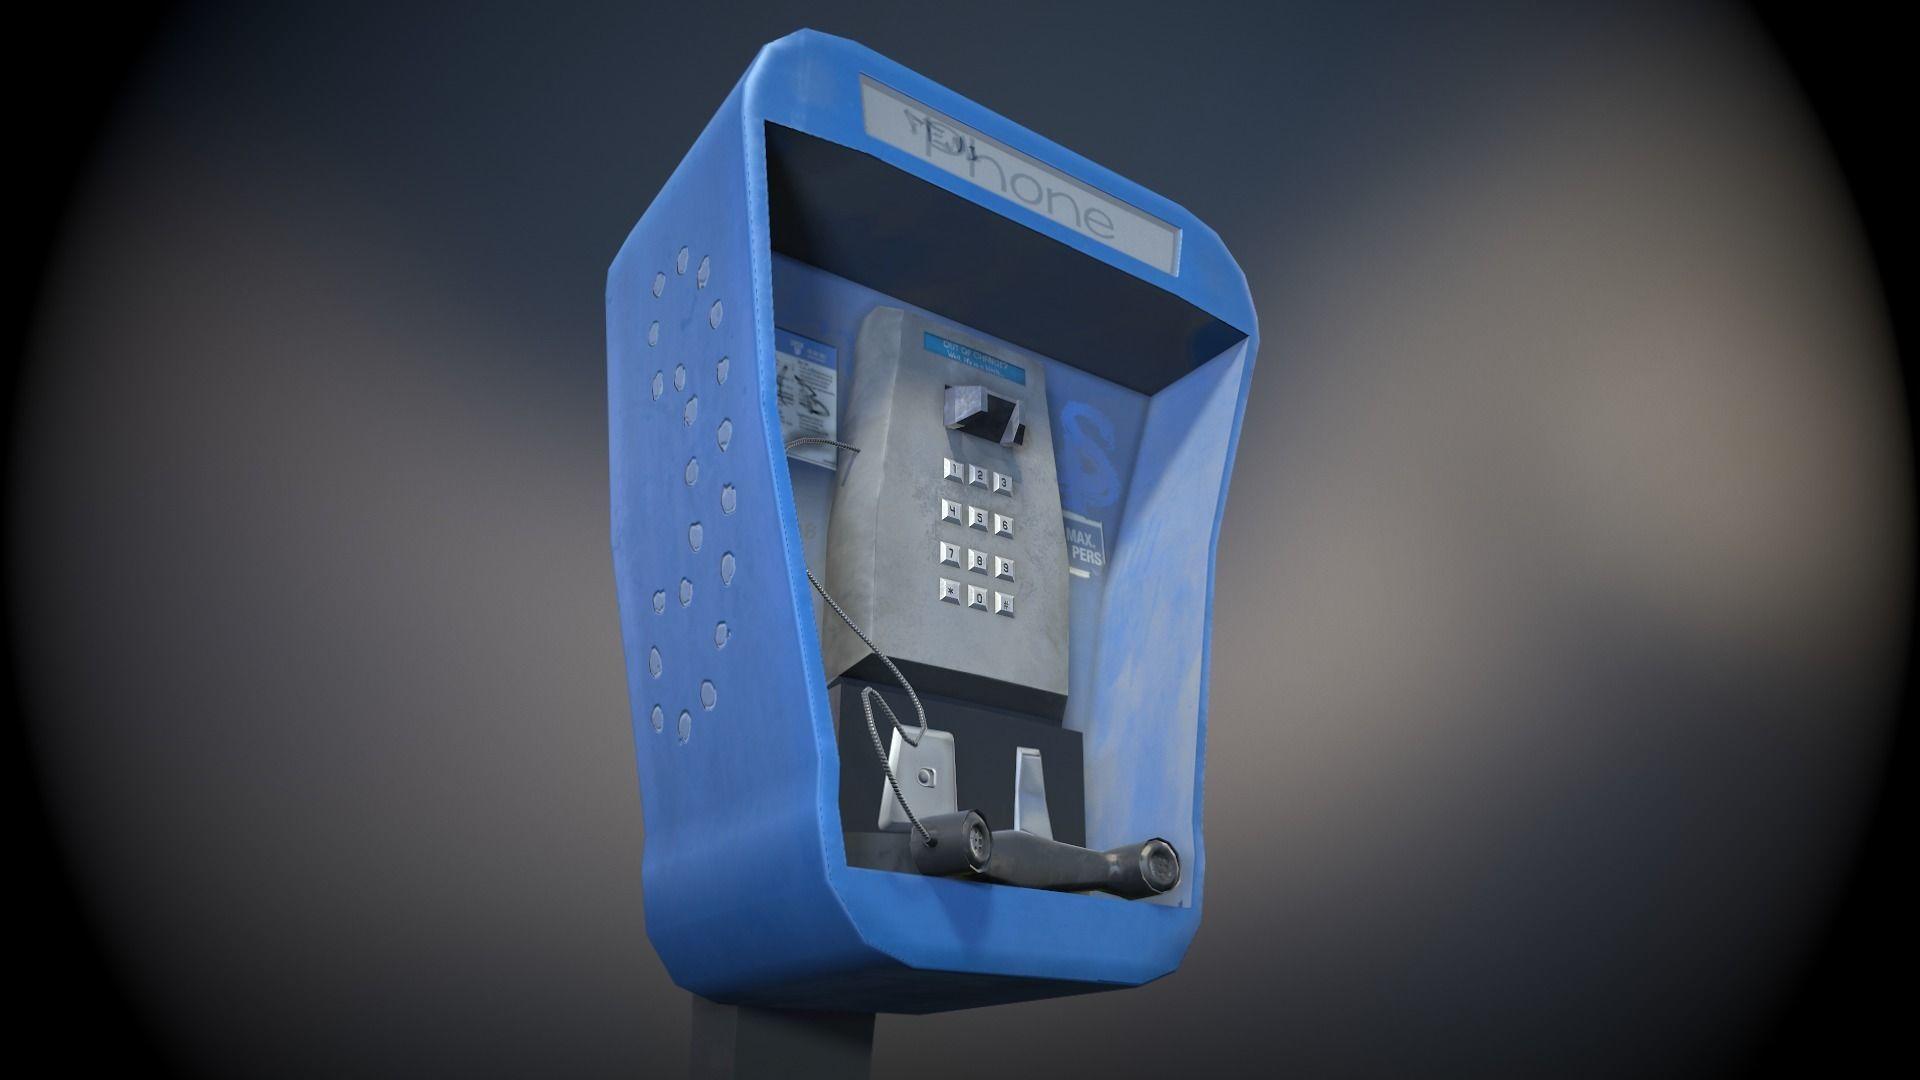 Stylized Payphone